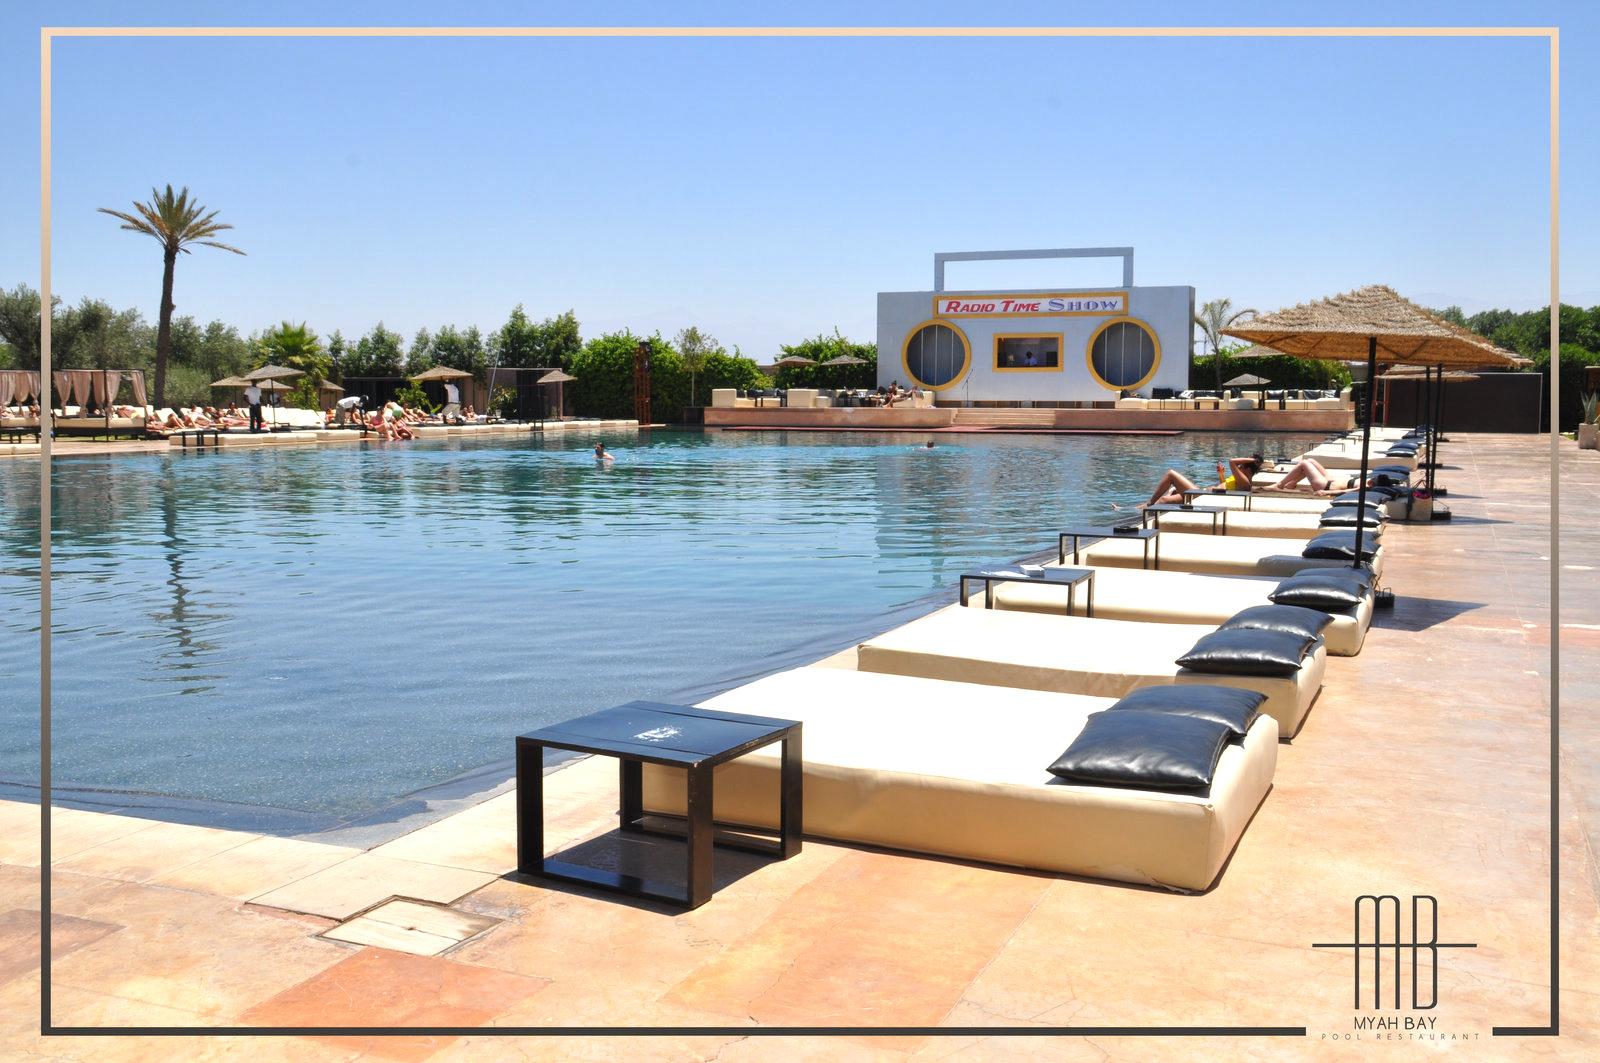 Hotel Myah Bay Marrakech Prix